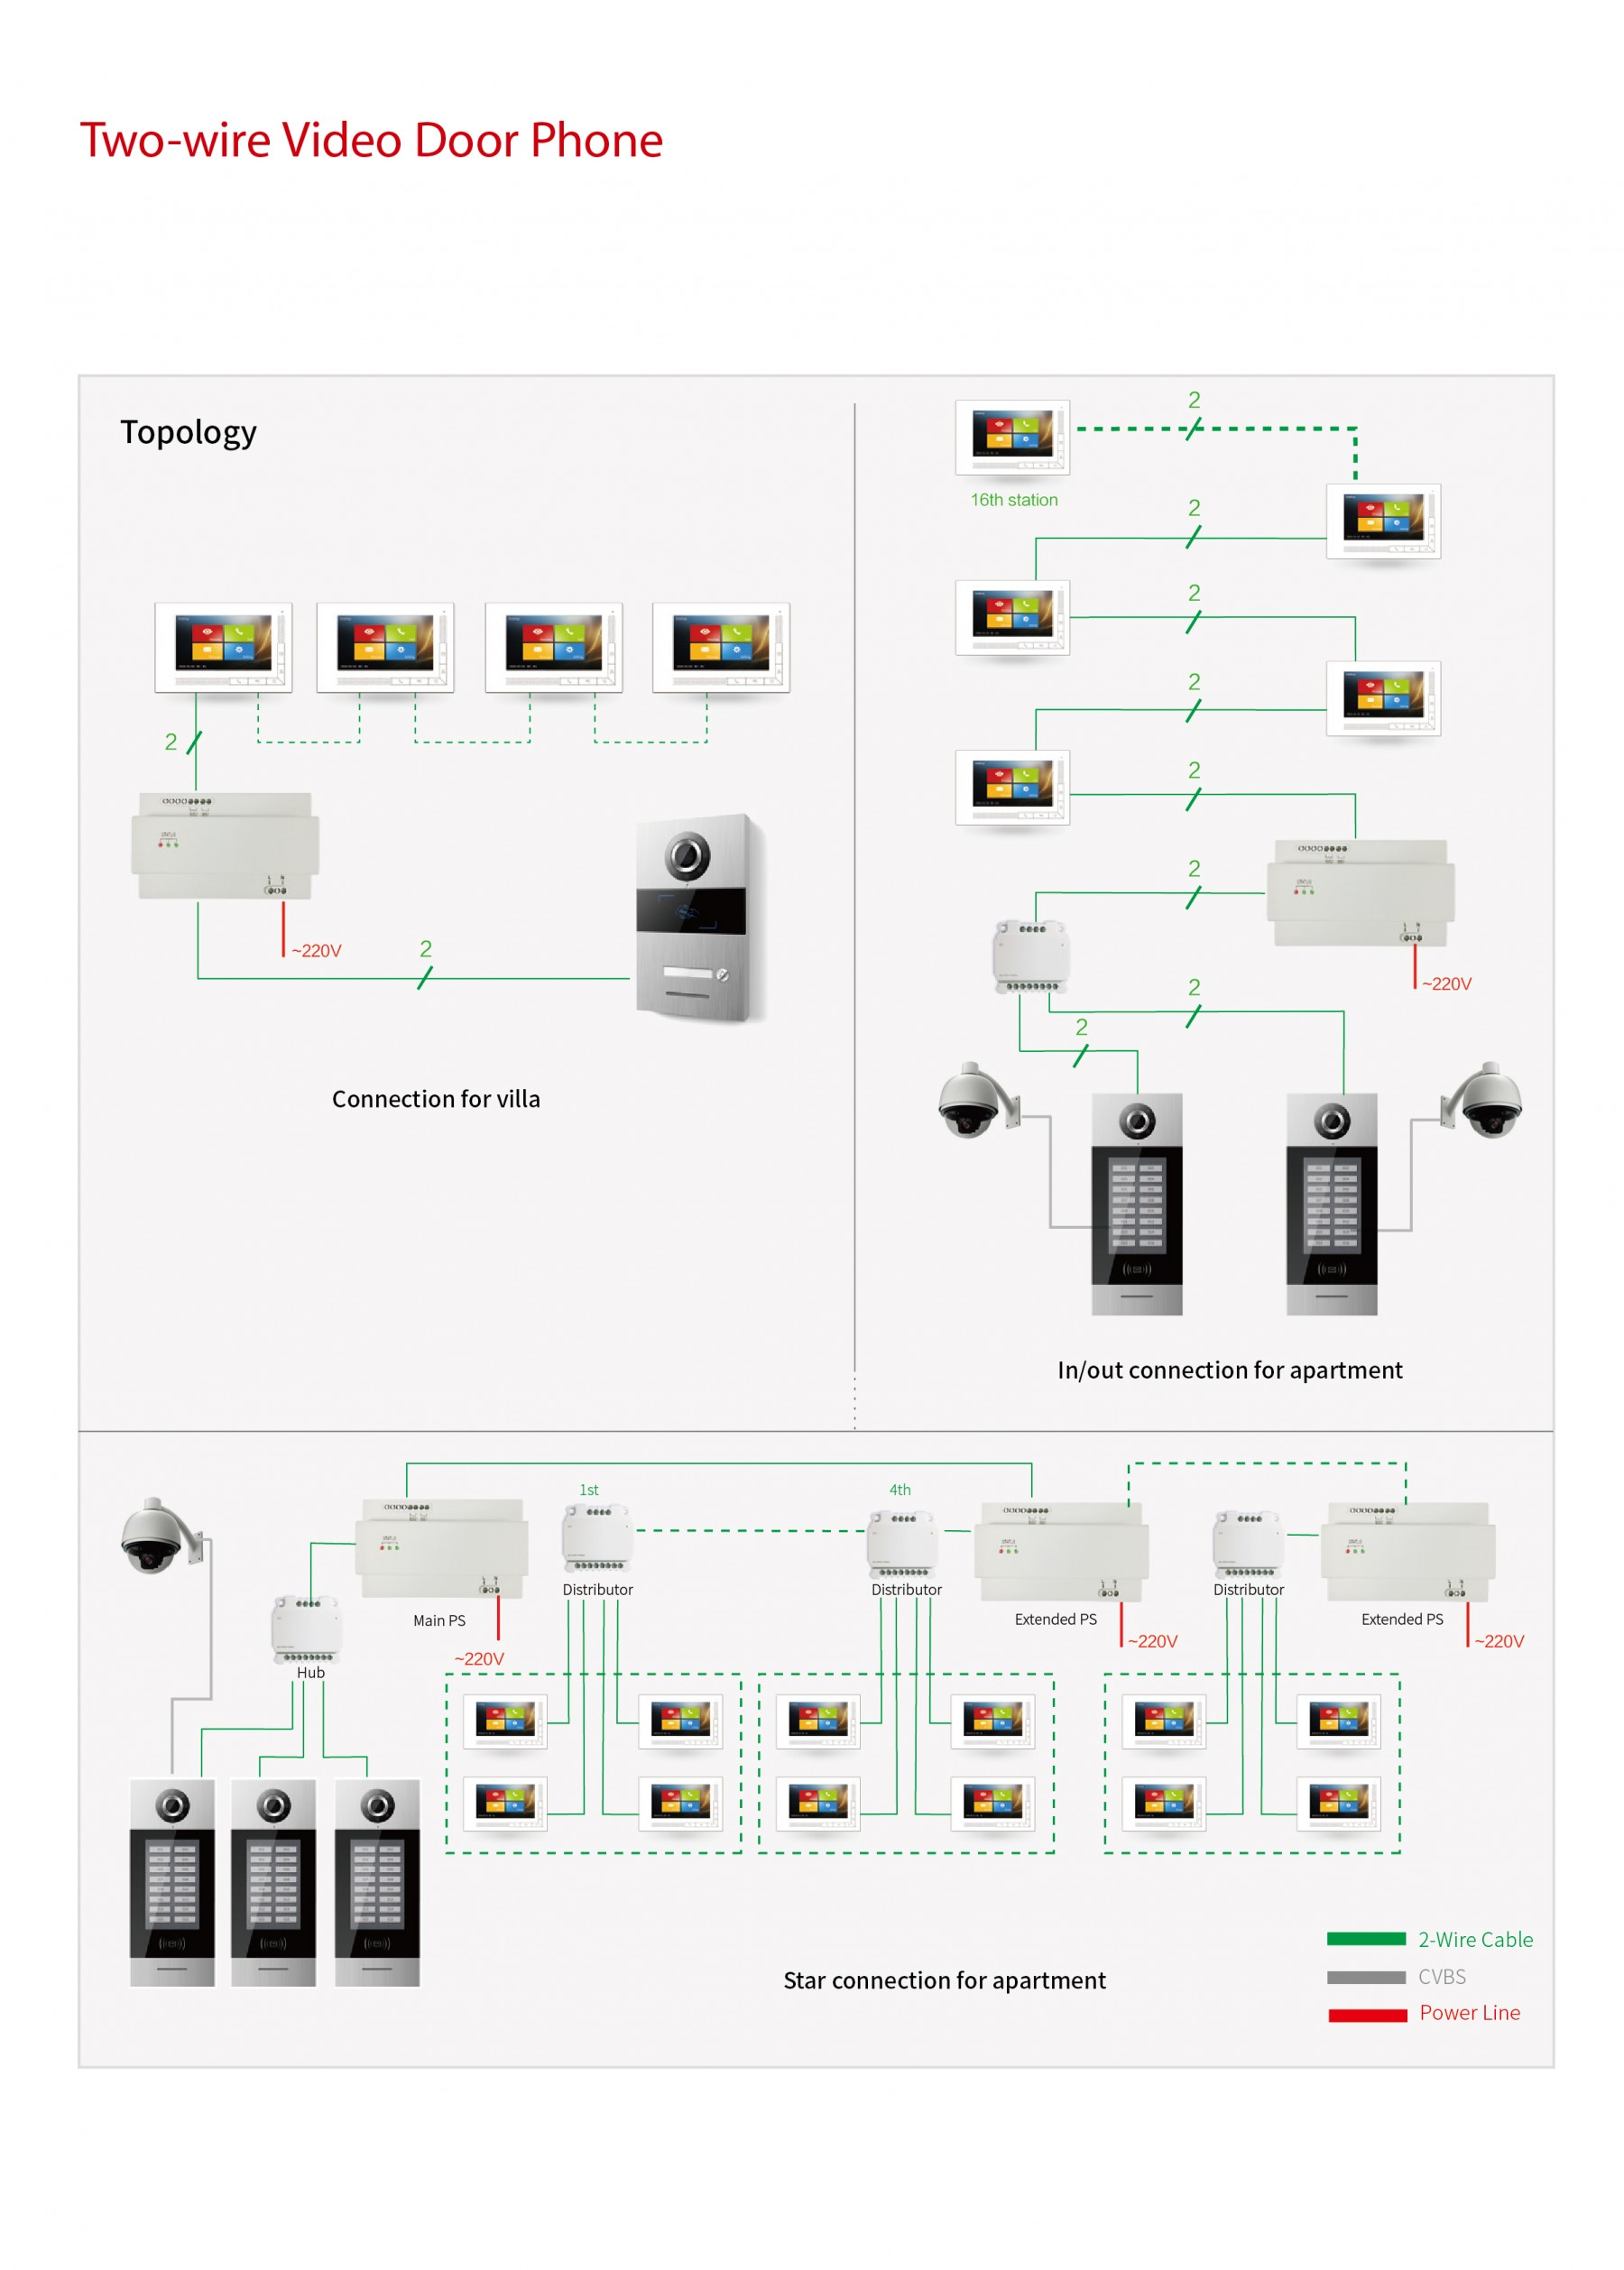 Card Swipe Wiring Diagram - Today Diagram Database on